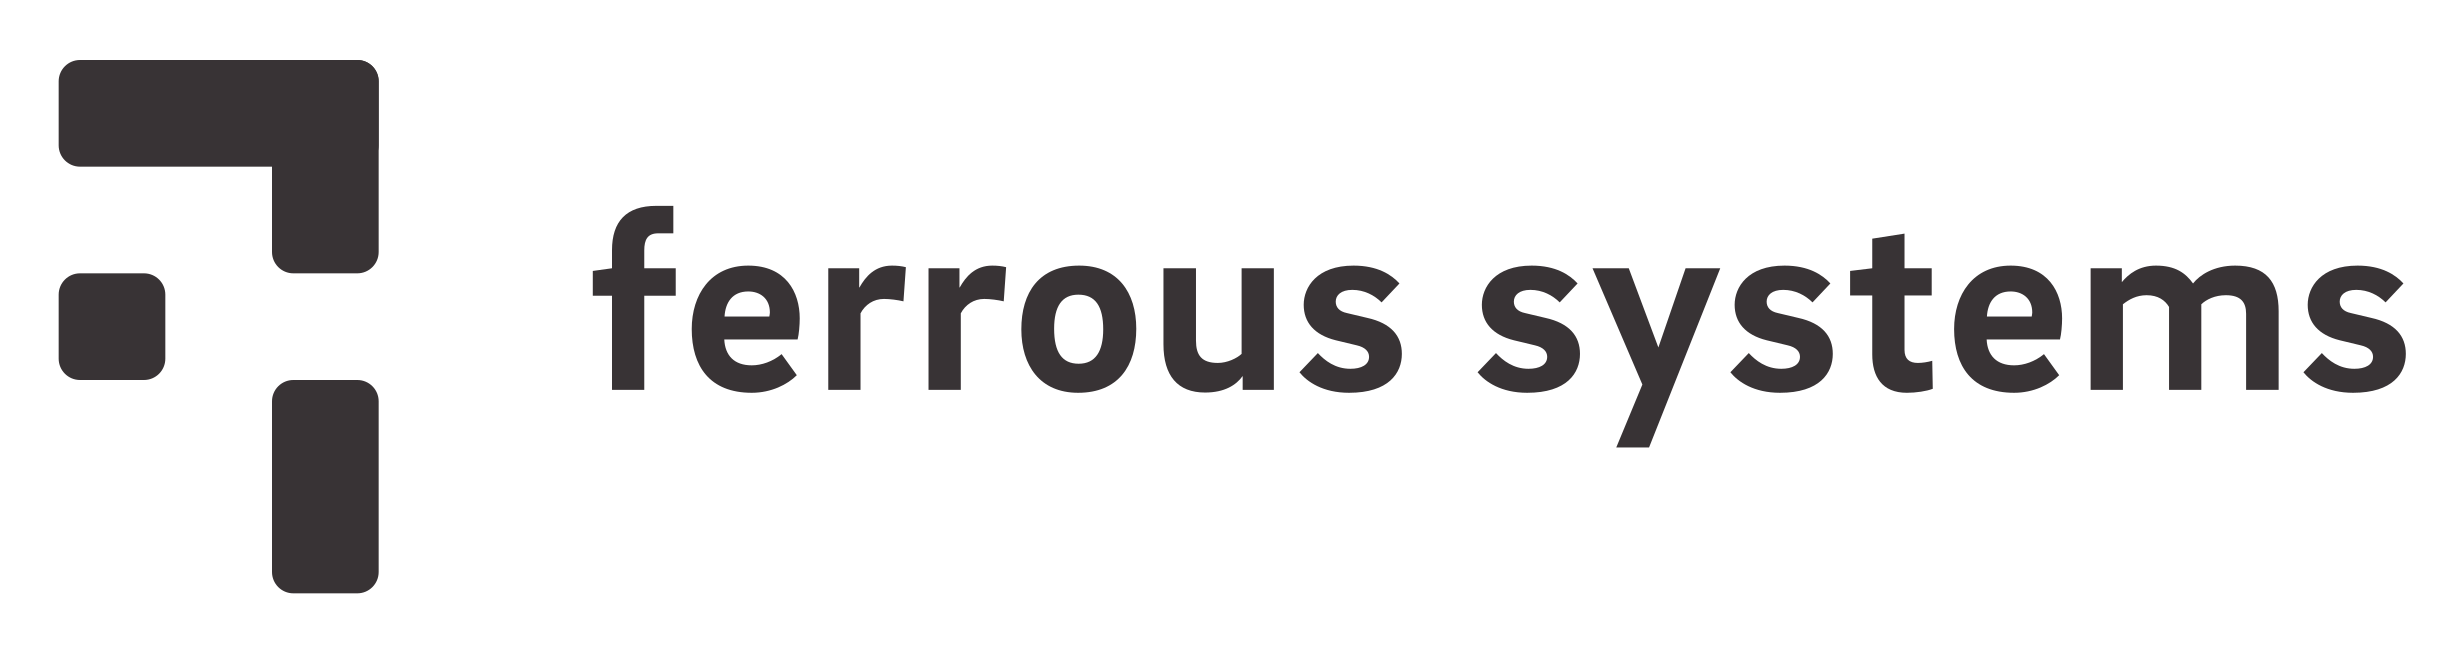 Ferrous Systems